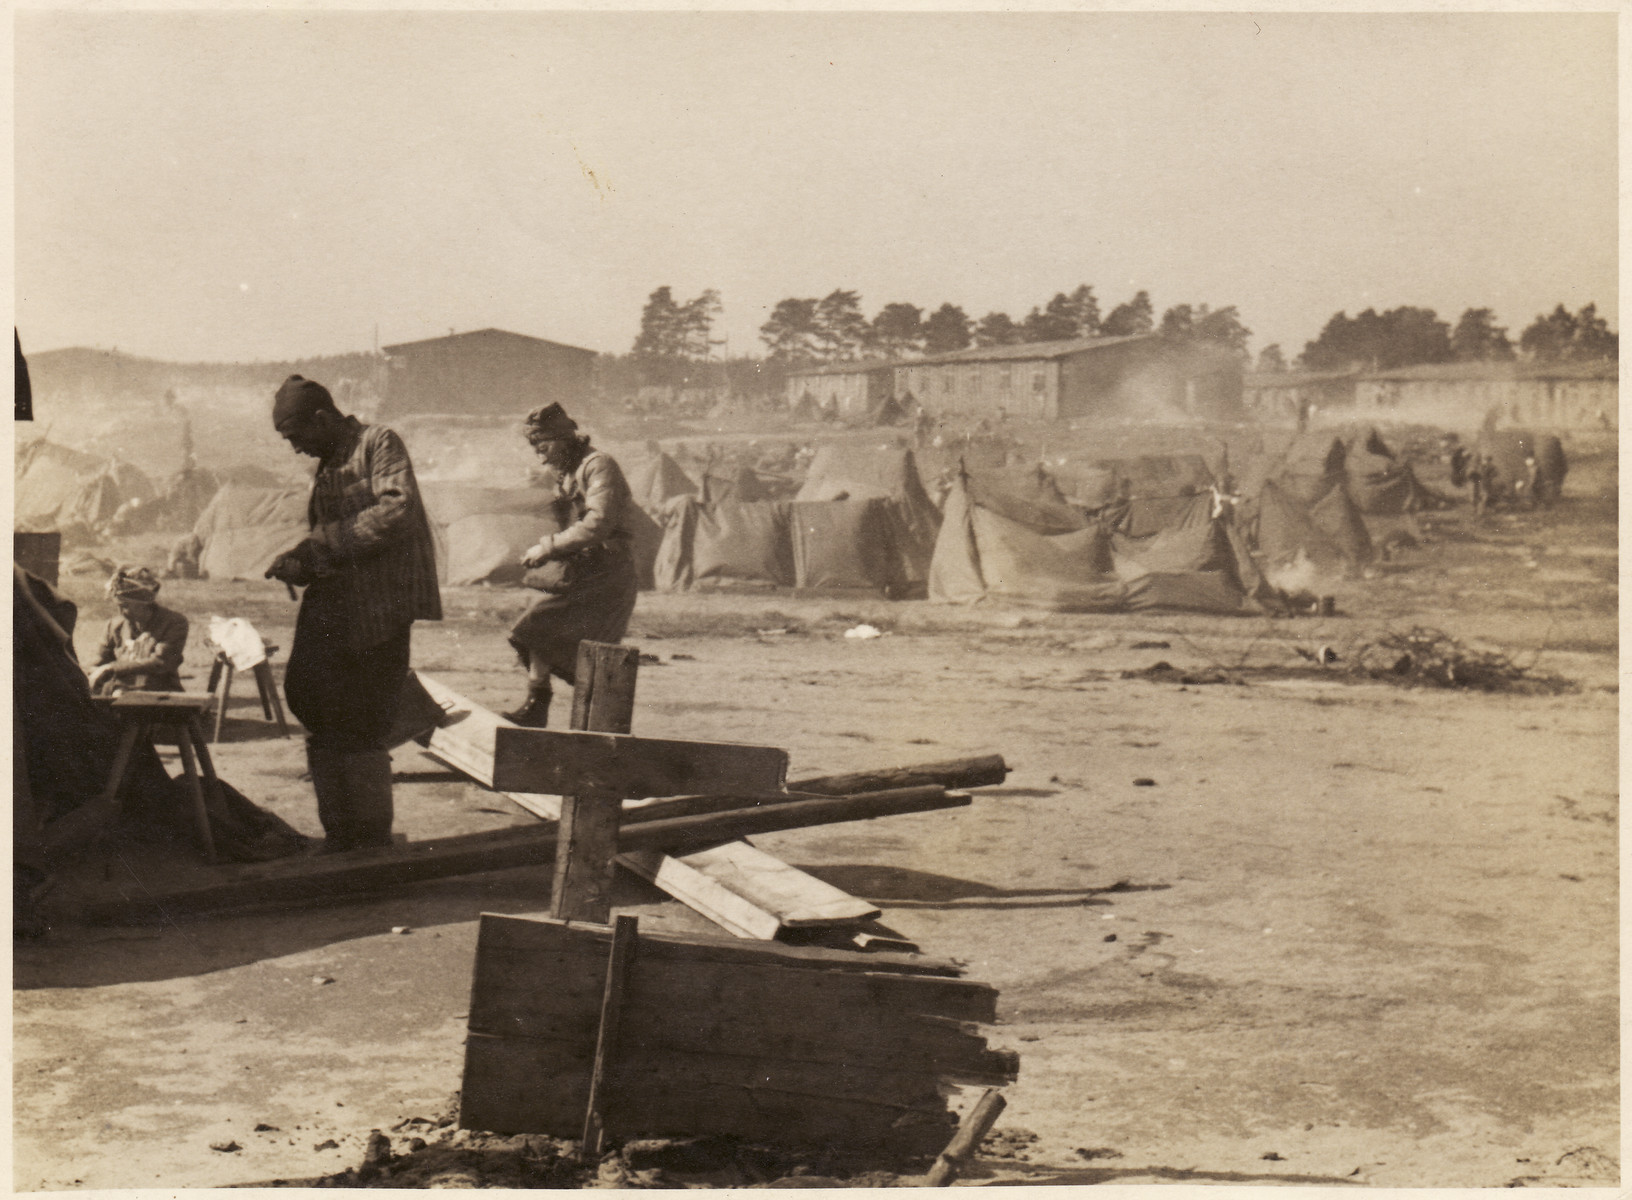 Survivors in a tent city set up at the Bergen-Belsen concentration camp.